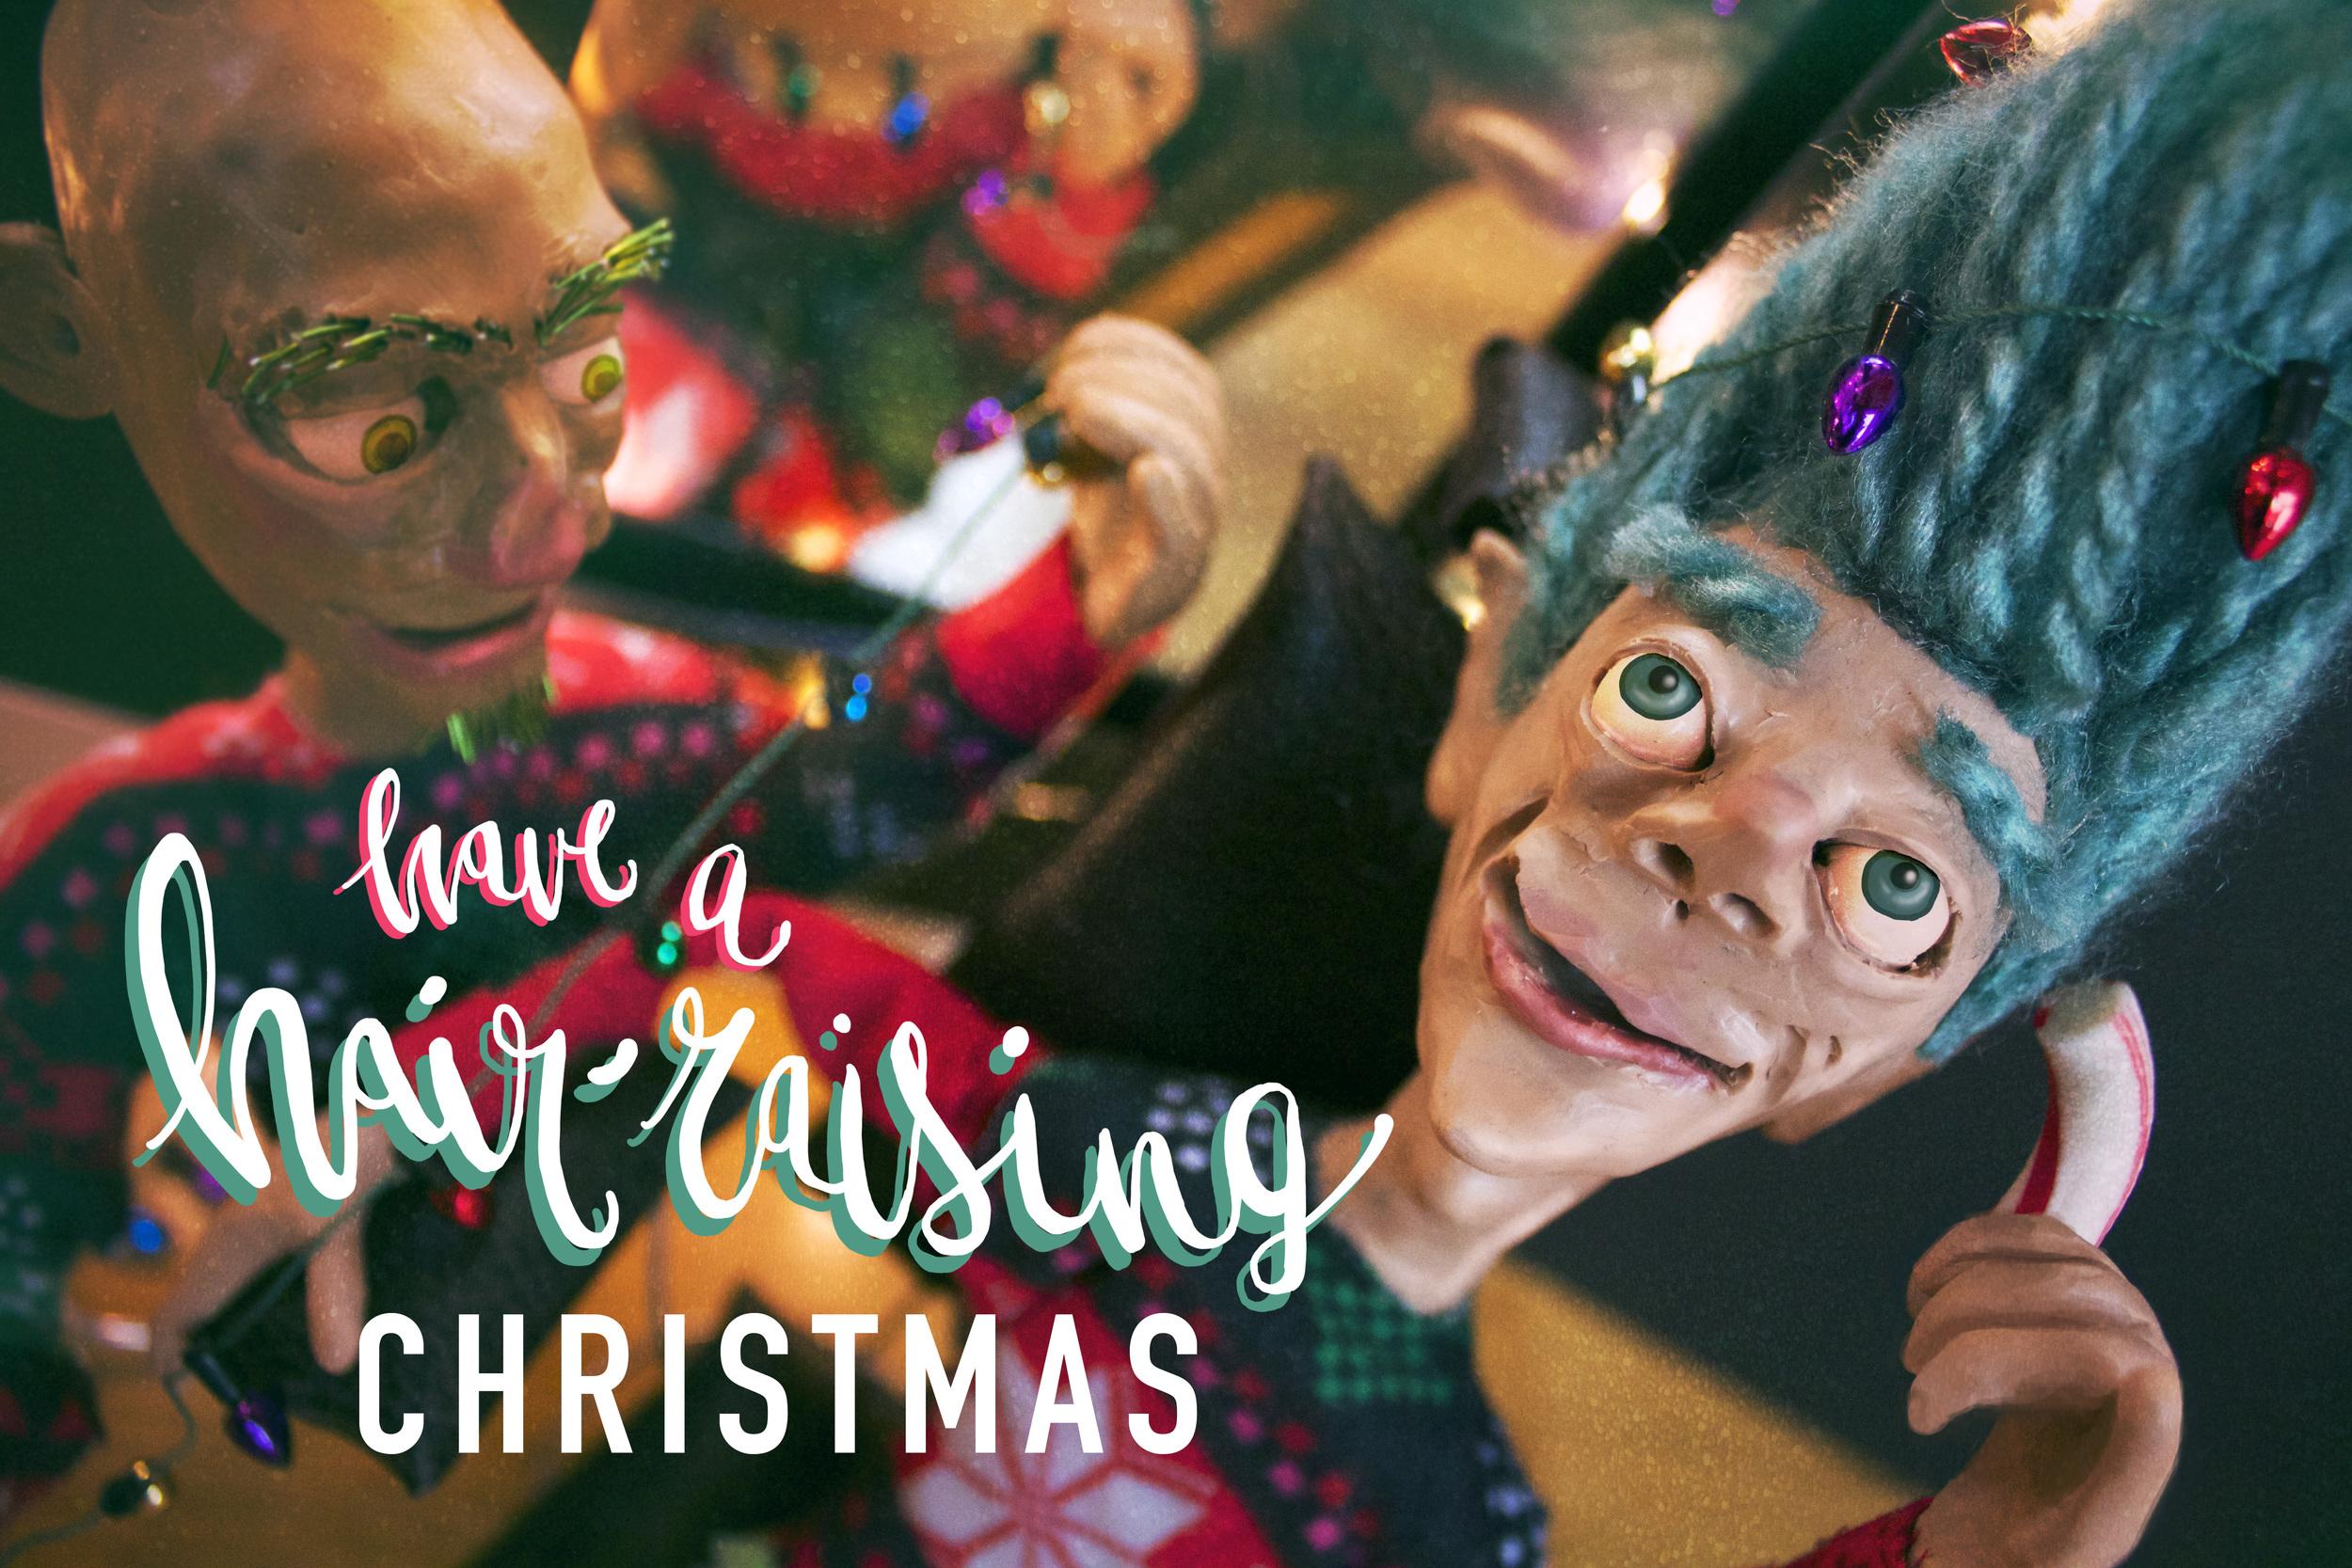 Hair-Raising Christmas, Final Image